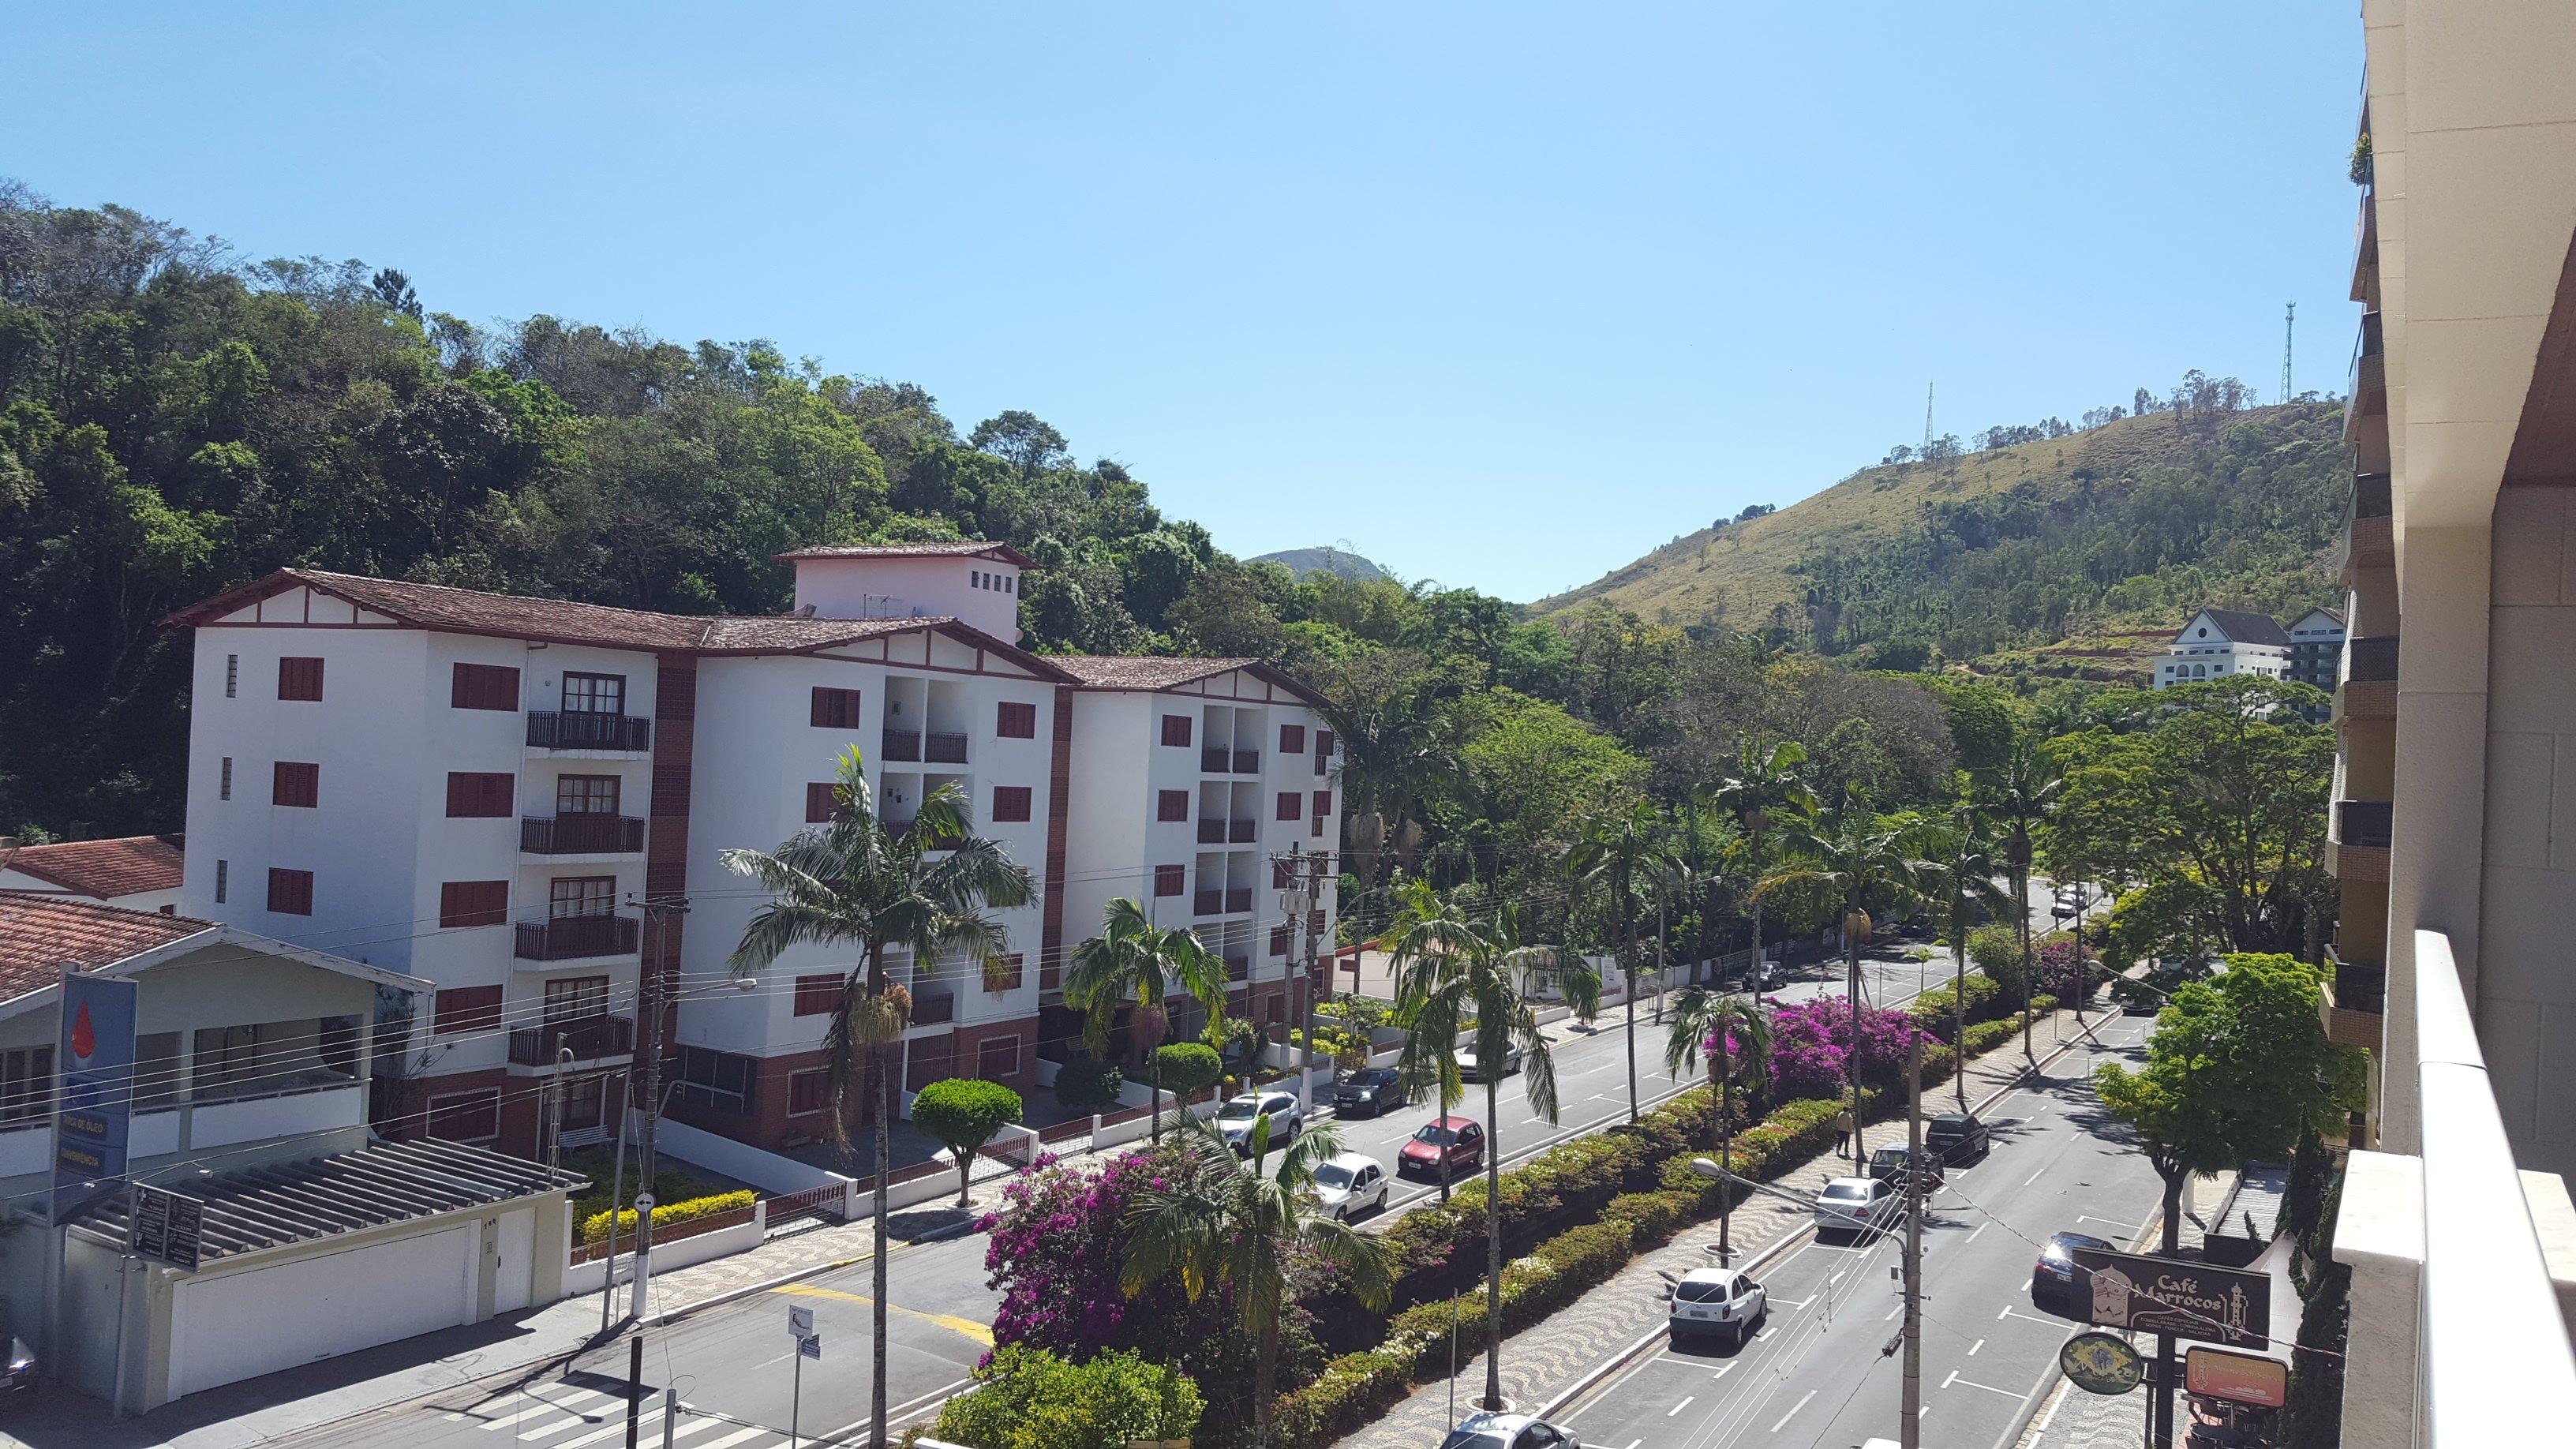 Hotel das Aguas